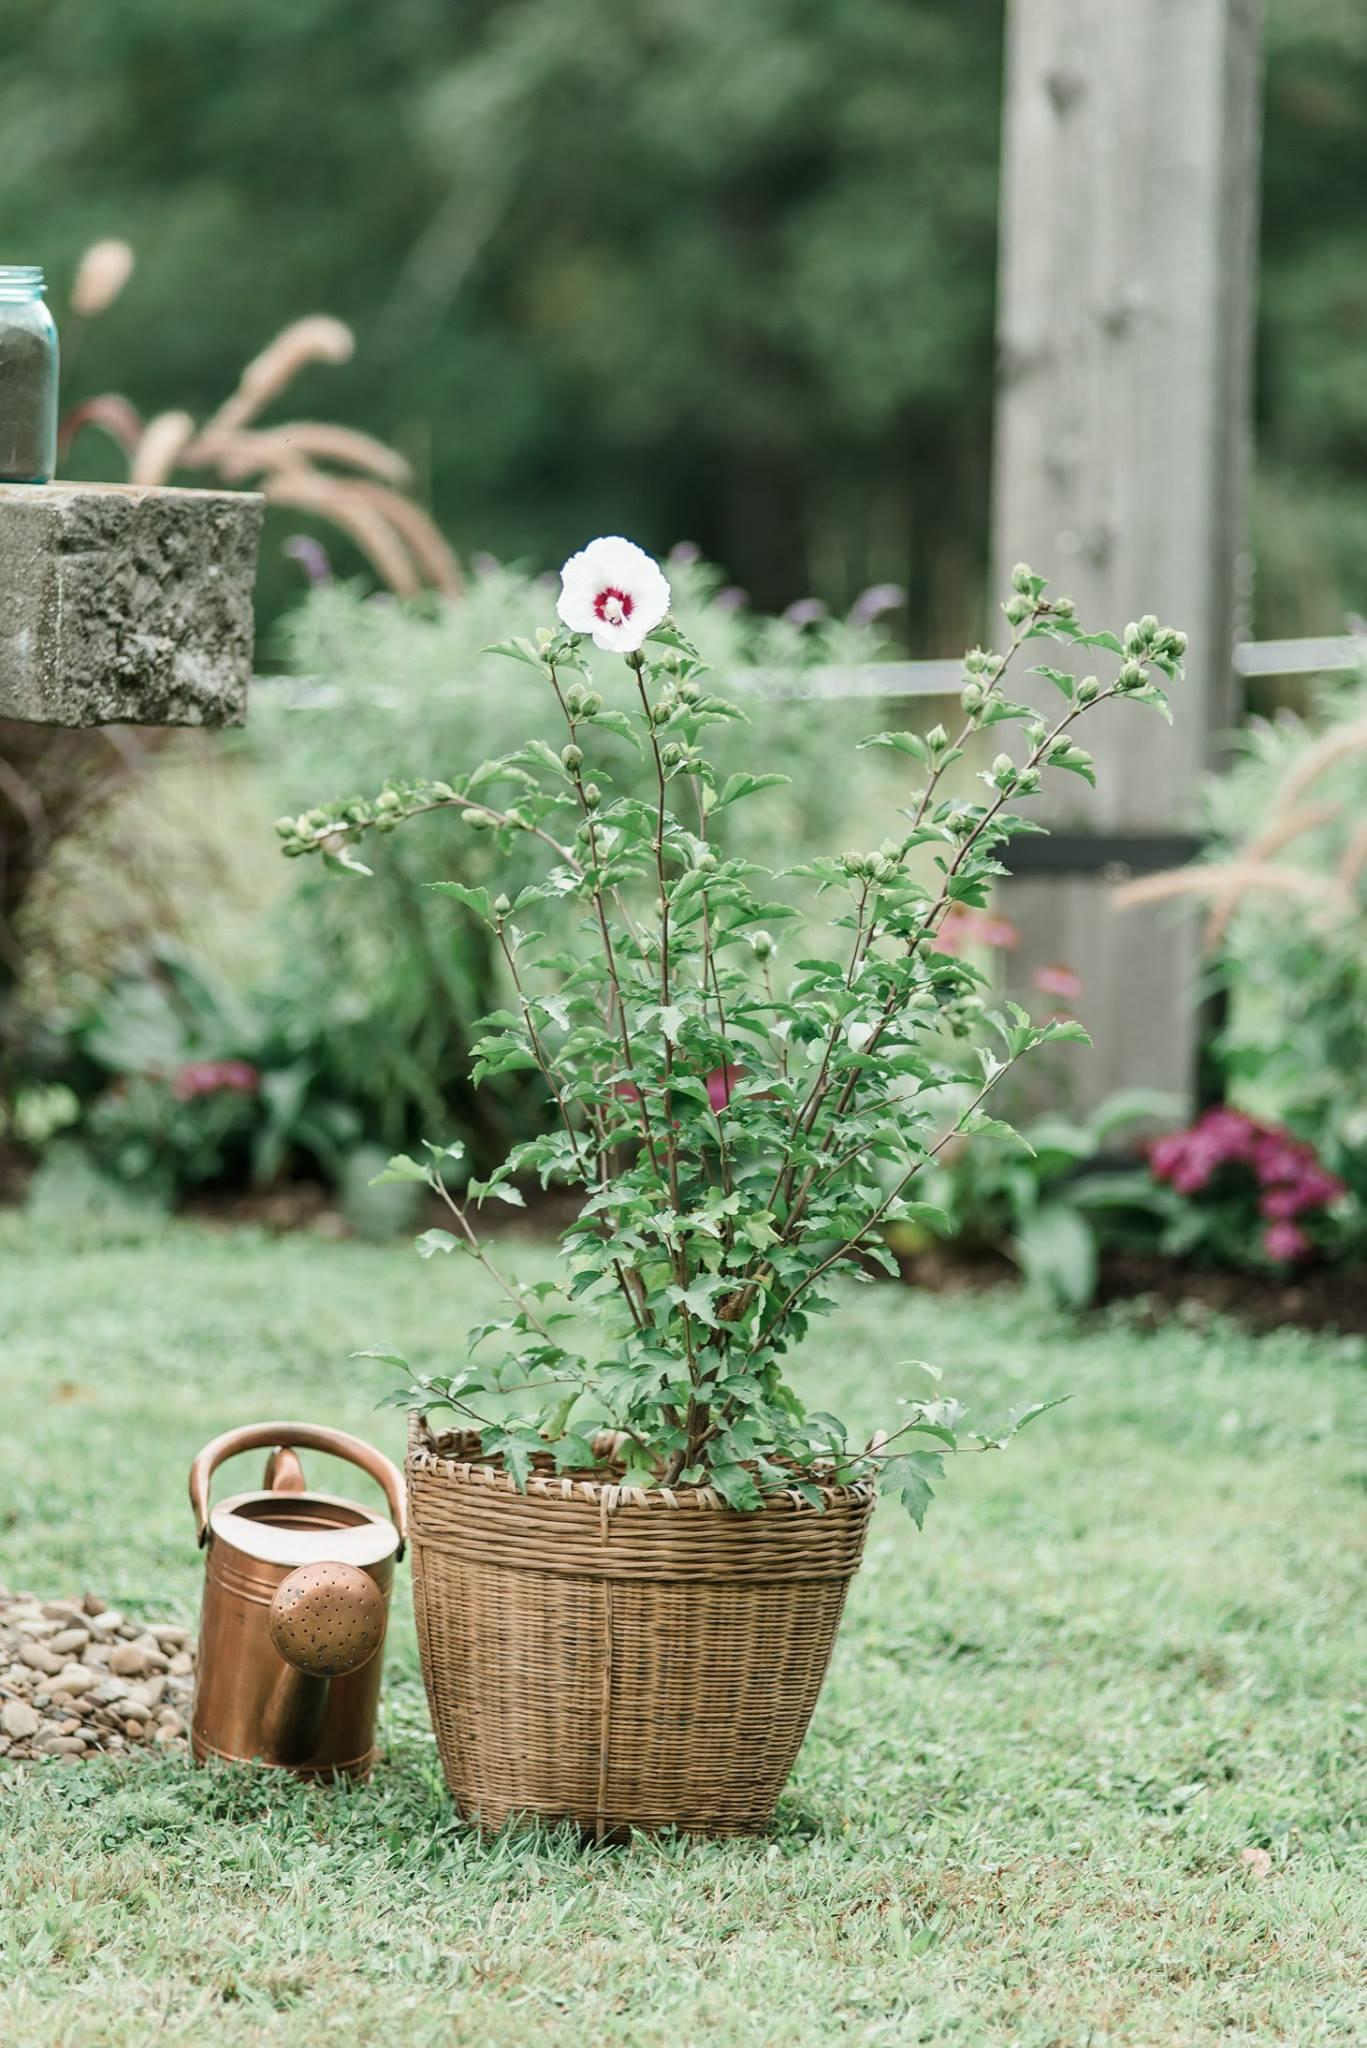 pennsylvania-backyard-wedding-love-diy-bohemian-romantic-colorful-0026.jpg